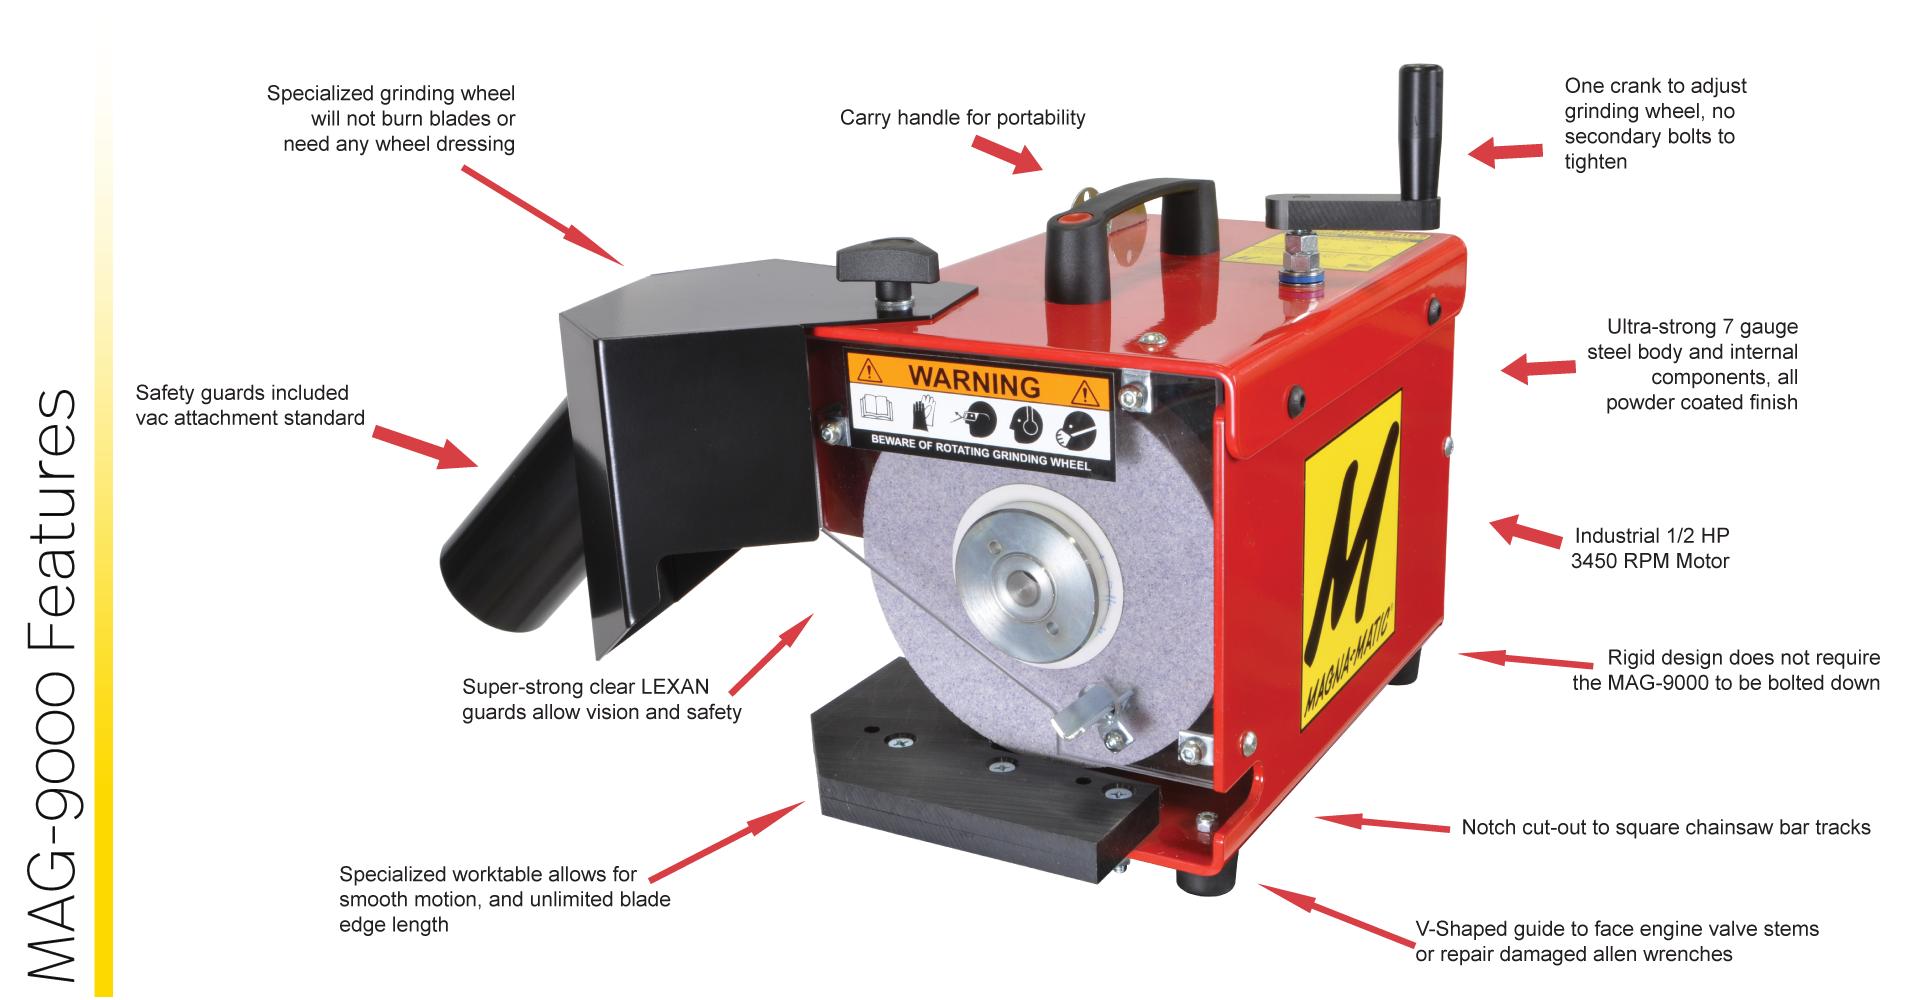 MAG-9000 Sharpener Features